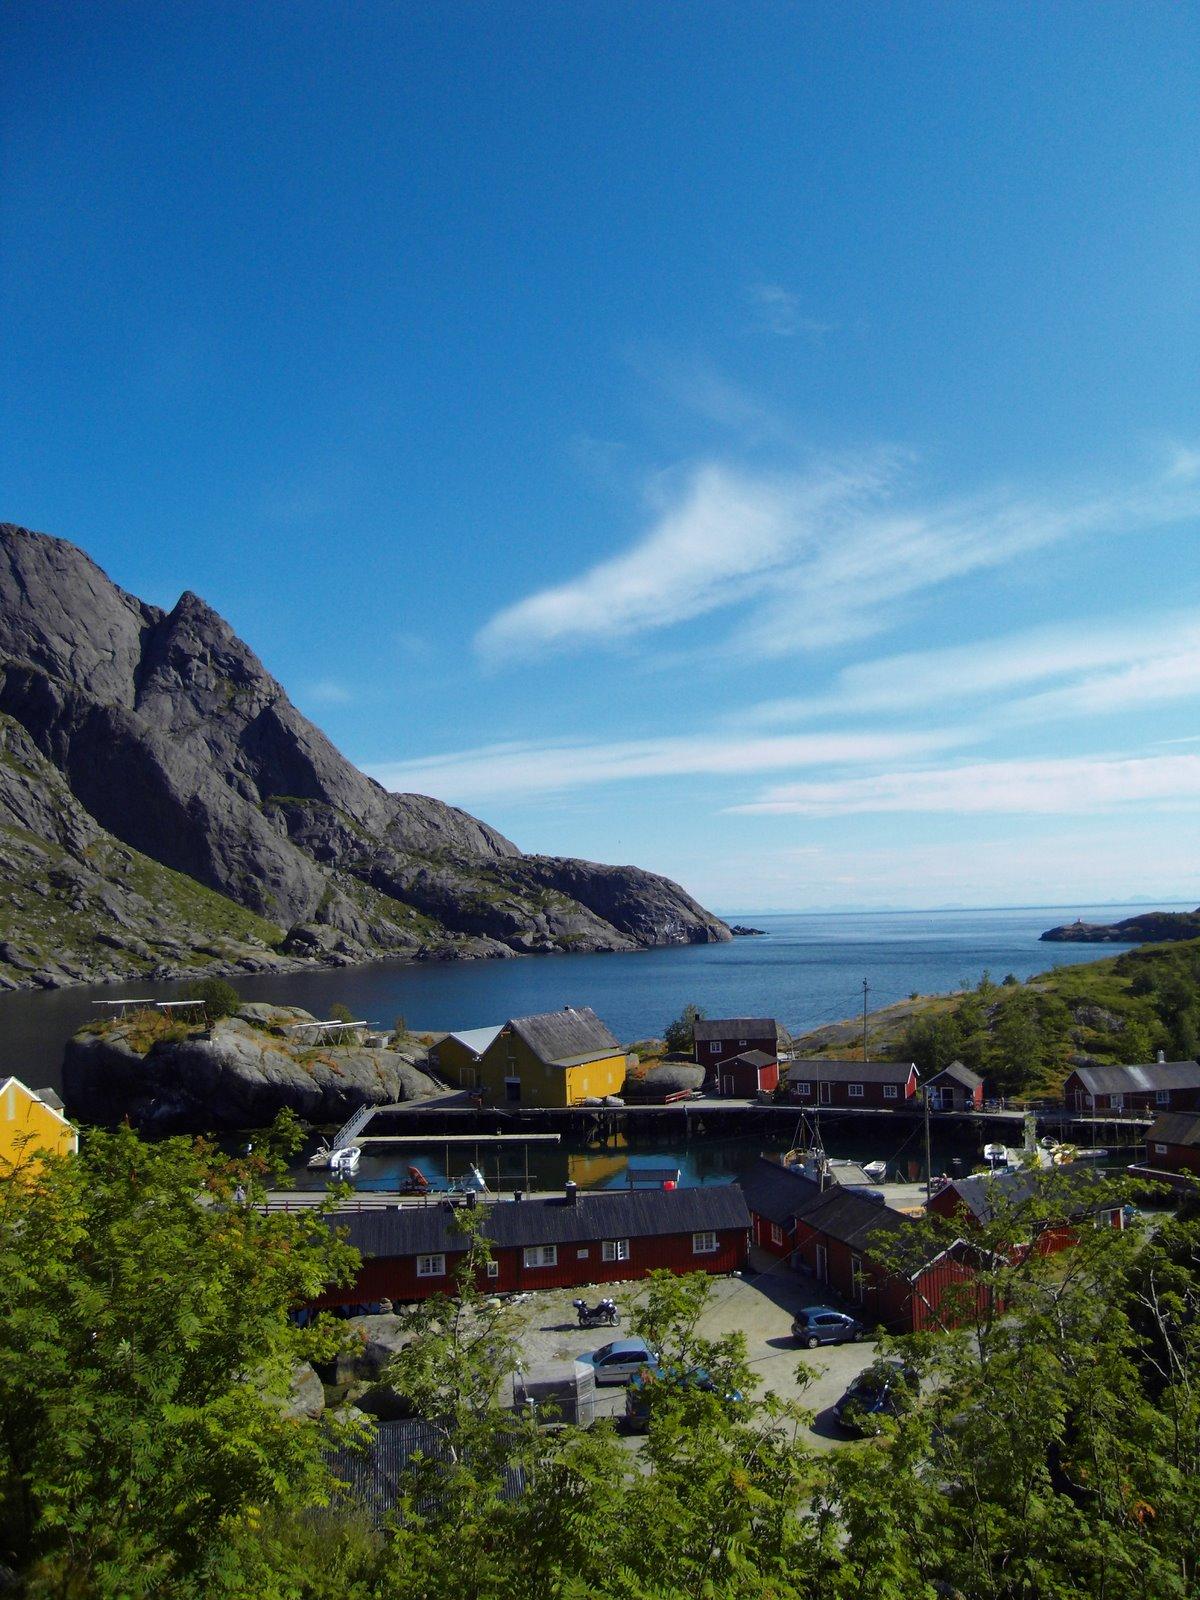 [nusfjord]